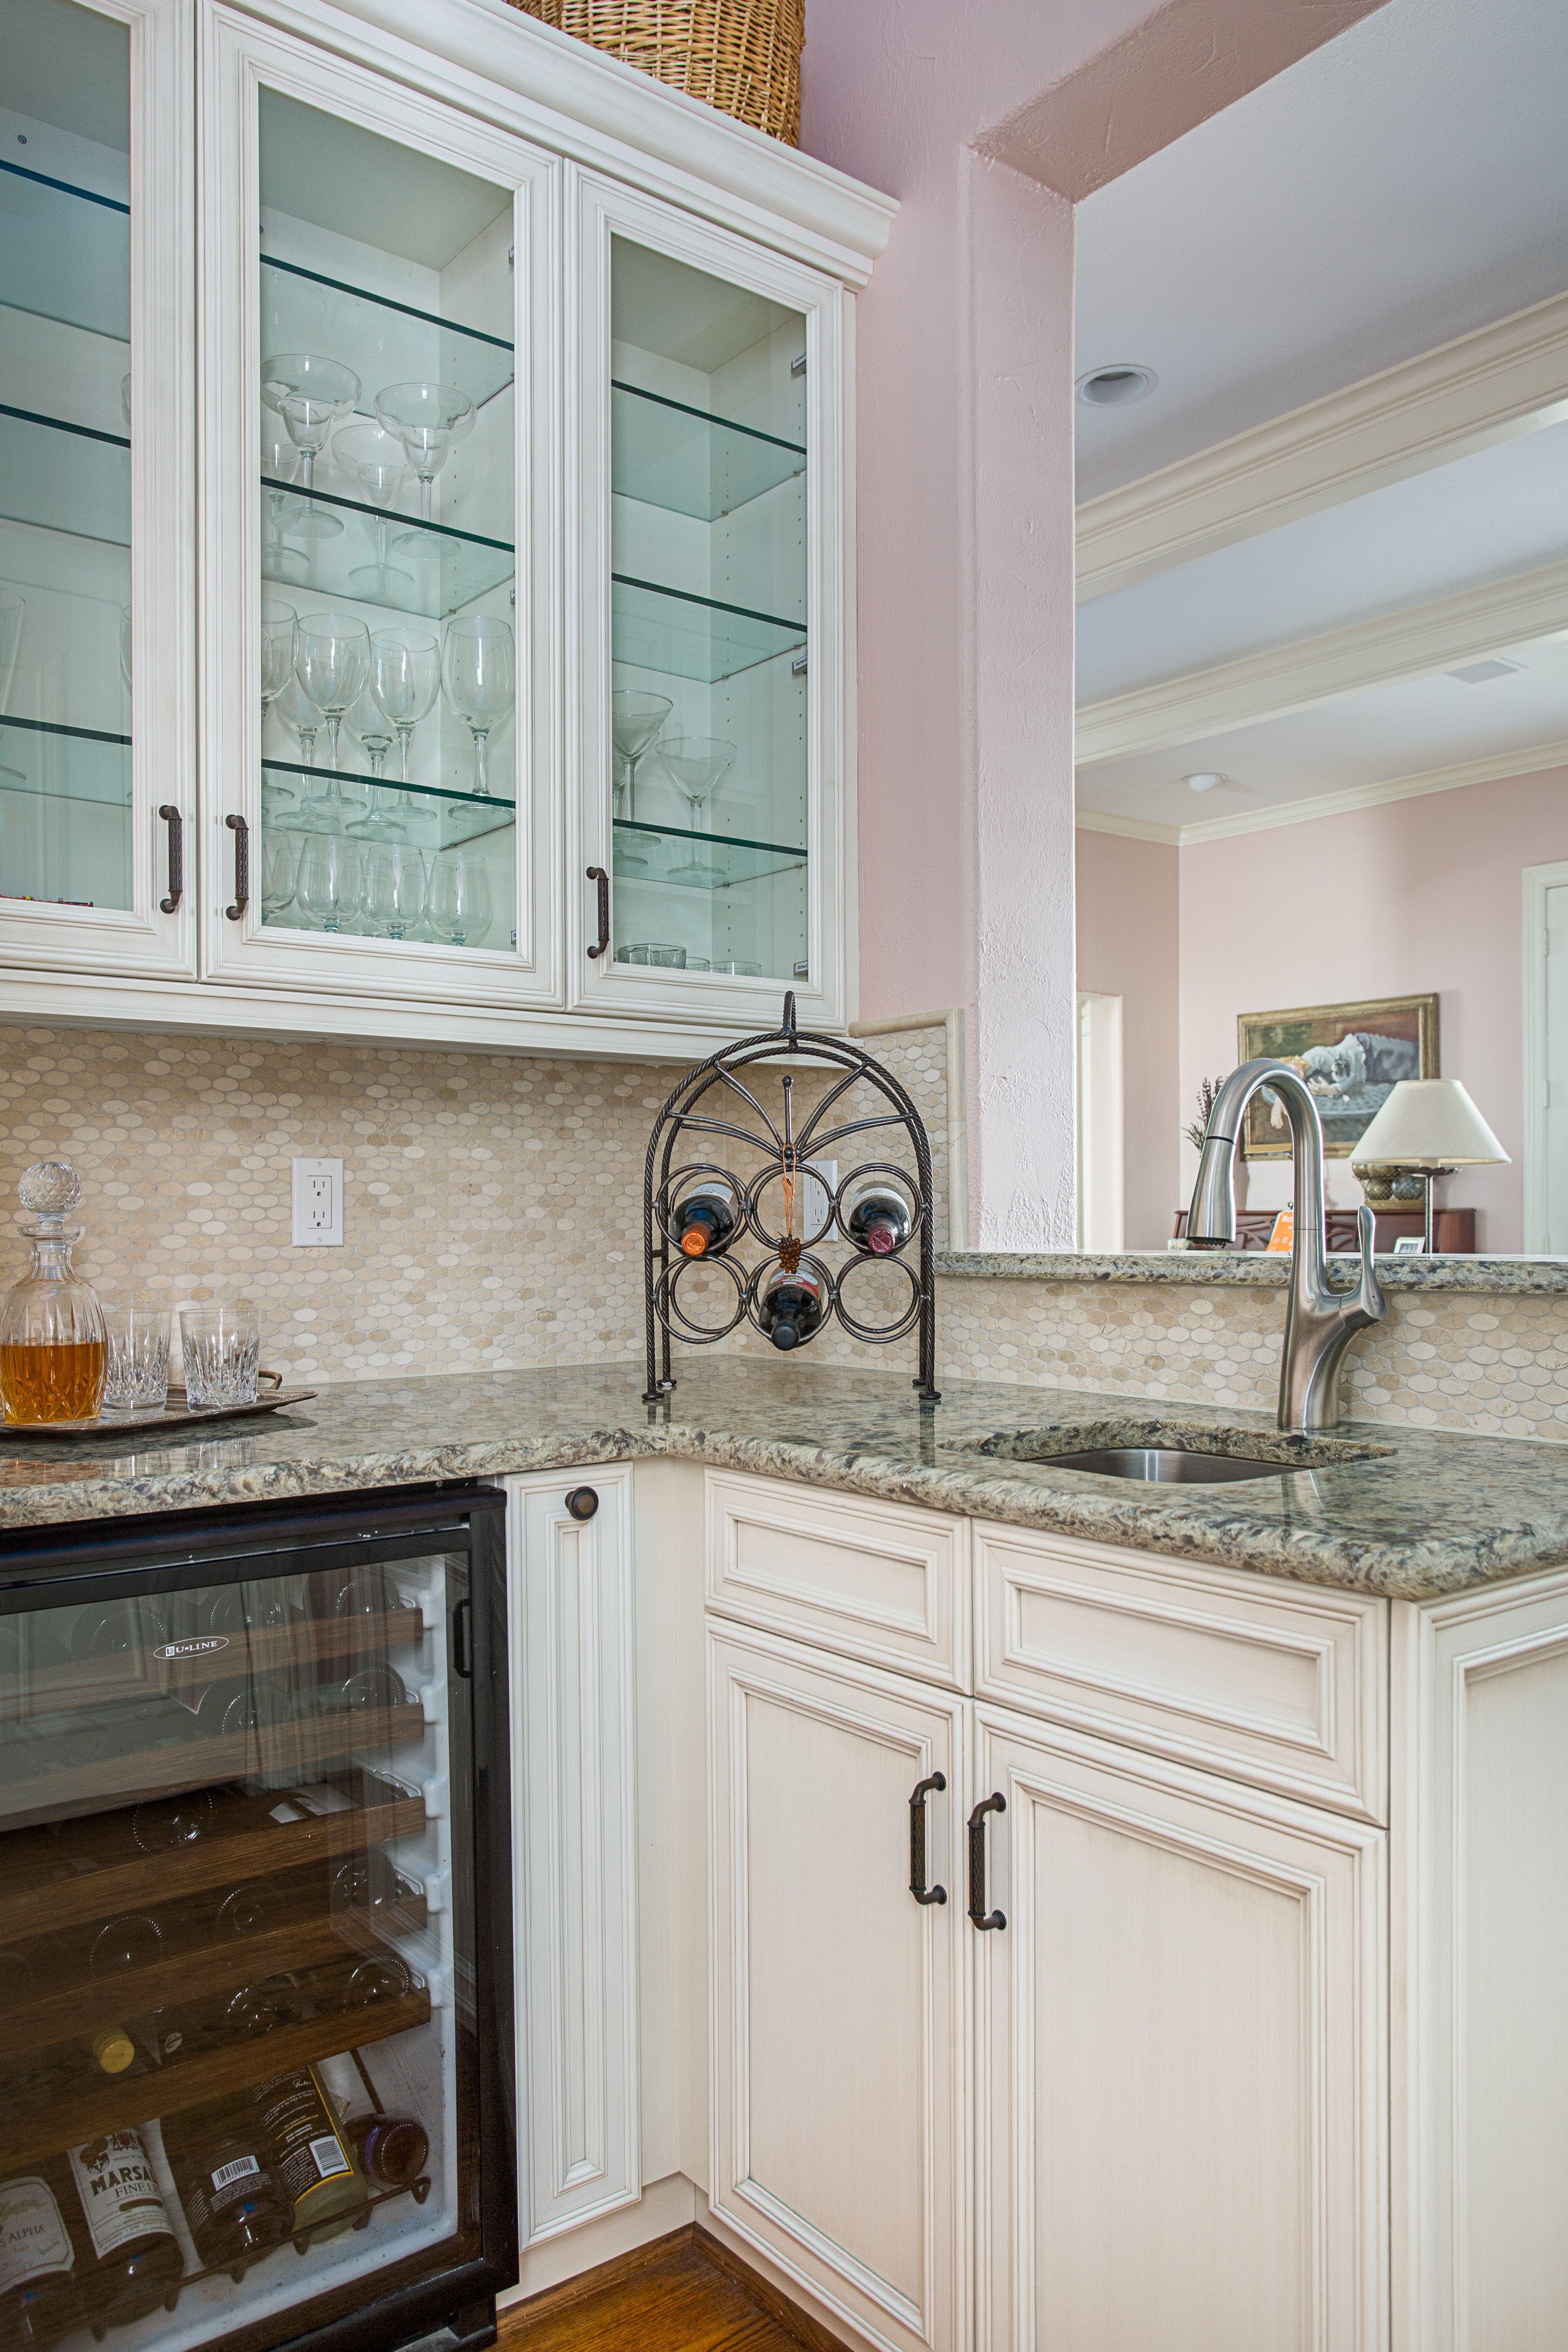 Kitchen Design Dallas Tx Amazing Traditional Southwestern Styled In Home Wet Bar  Kitchen Design Decorating Design